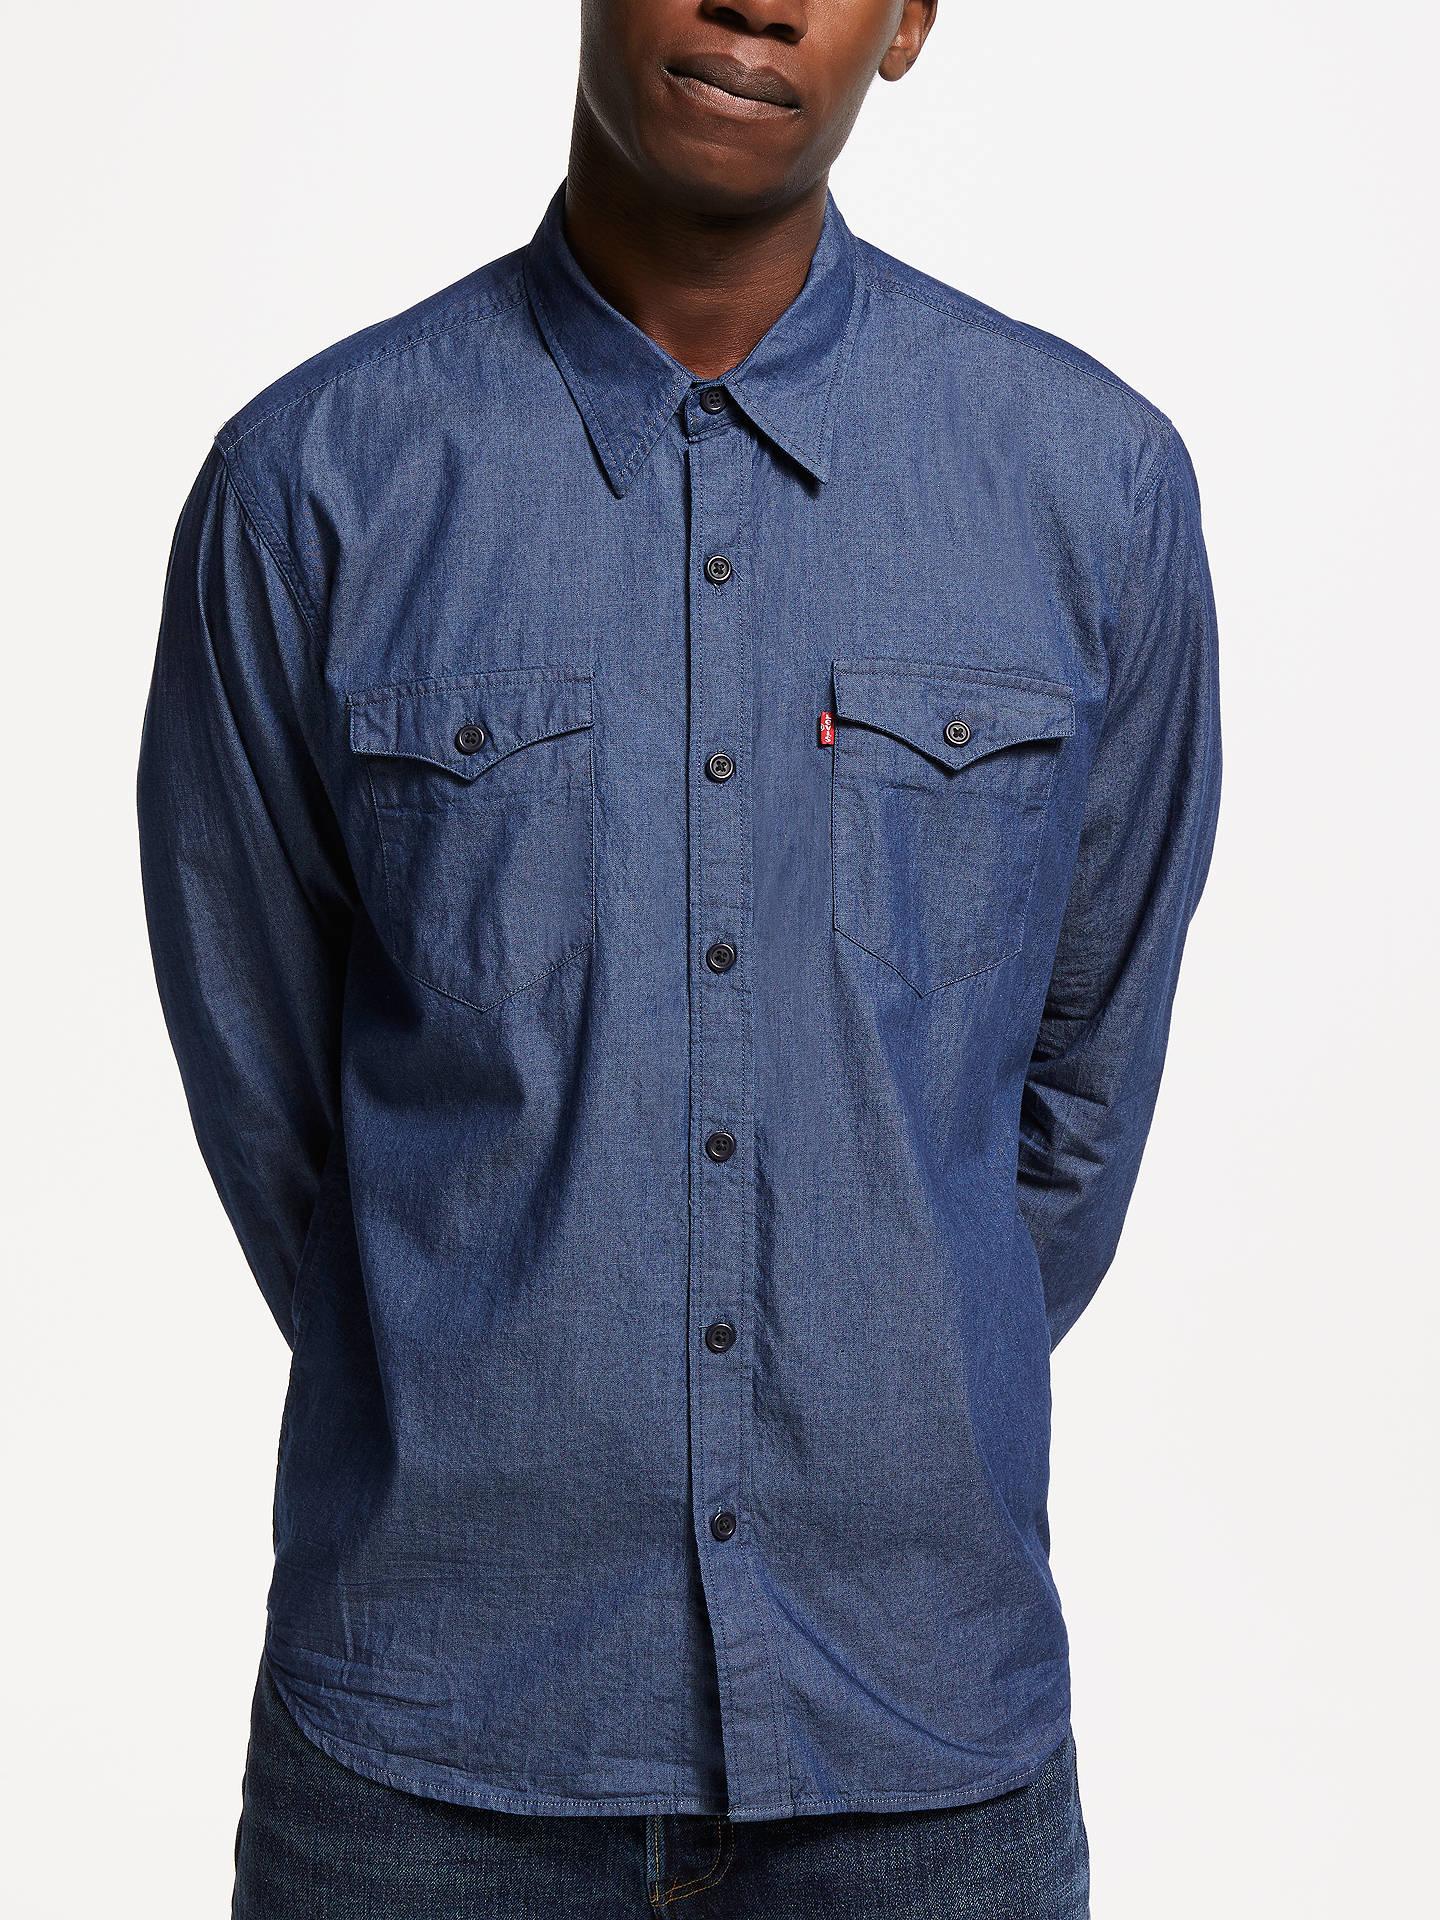 5b10ba009c2 Buy Levi's Barstow Western Denim Shirt, Blue, M Online at johnlewis. ...